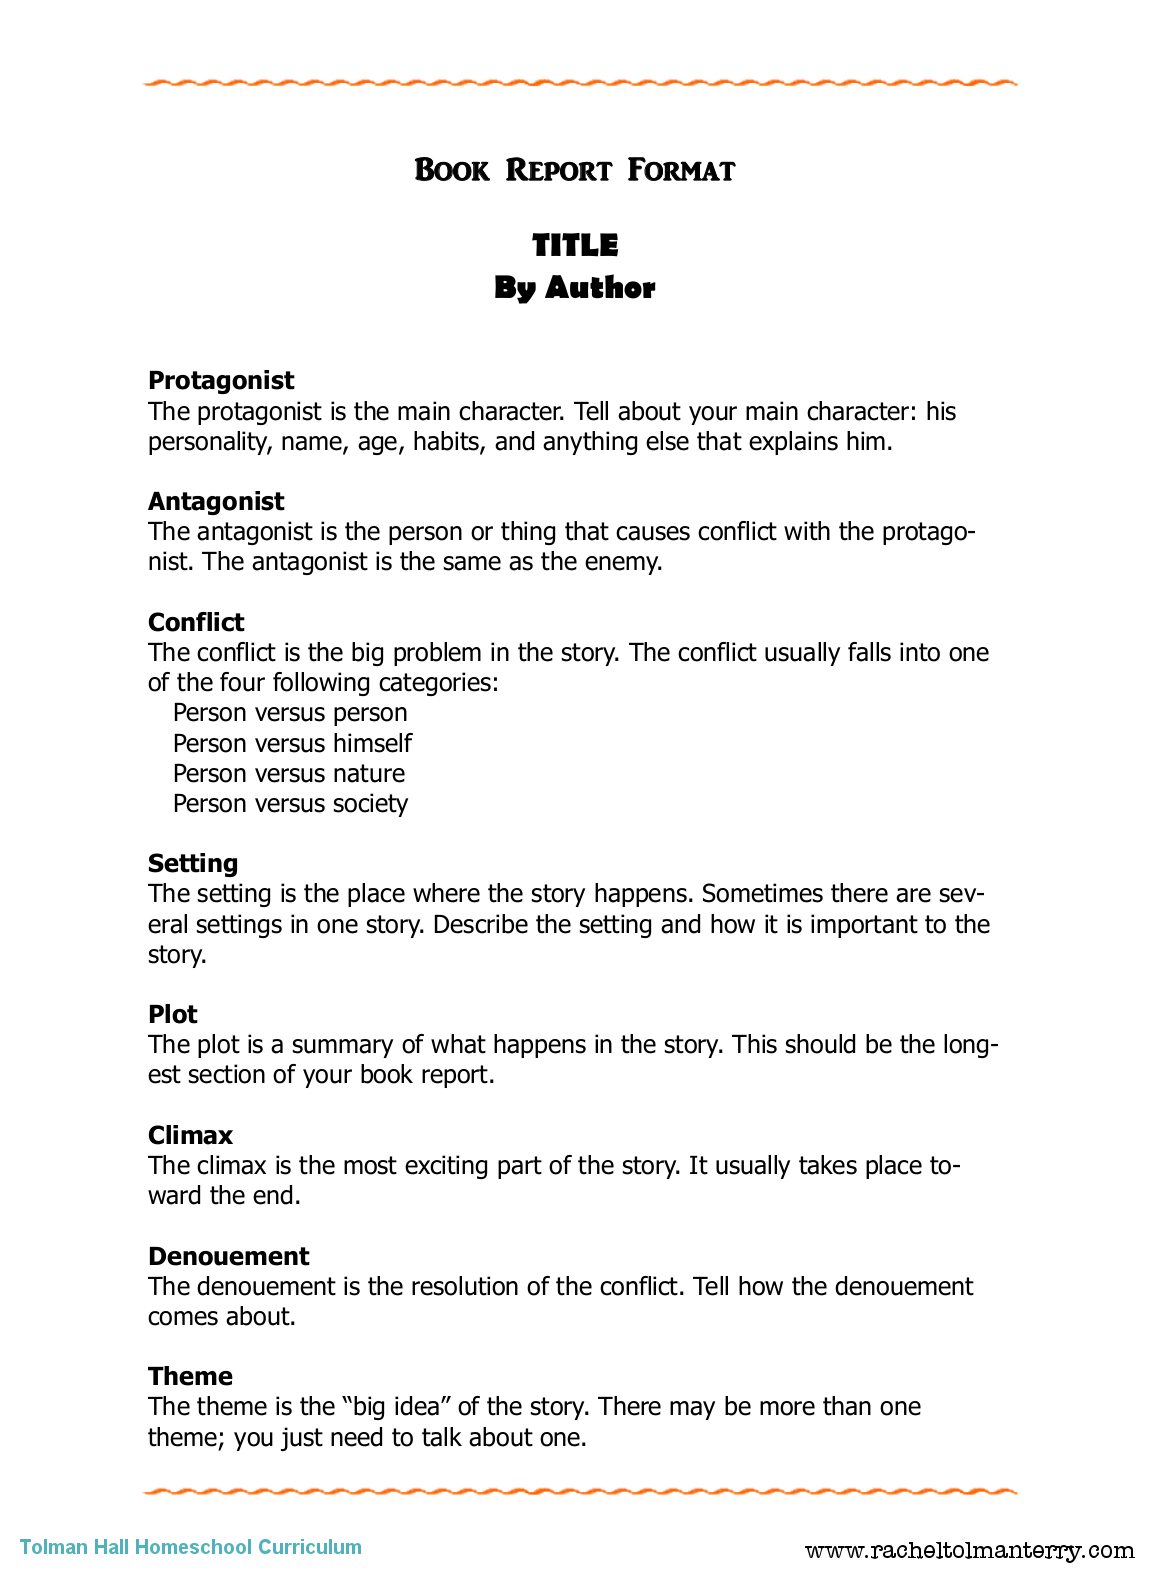 book report sample - solarfm.tk